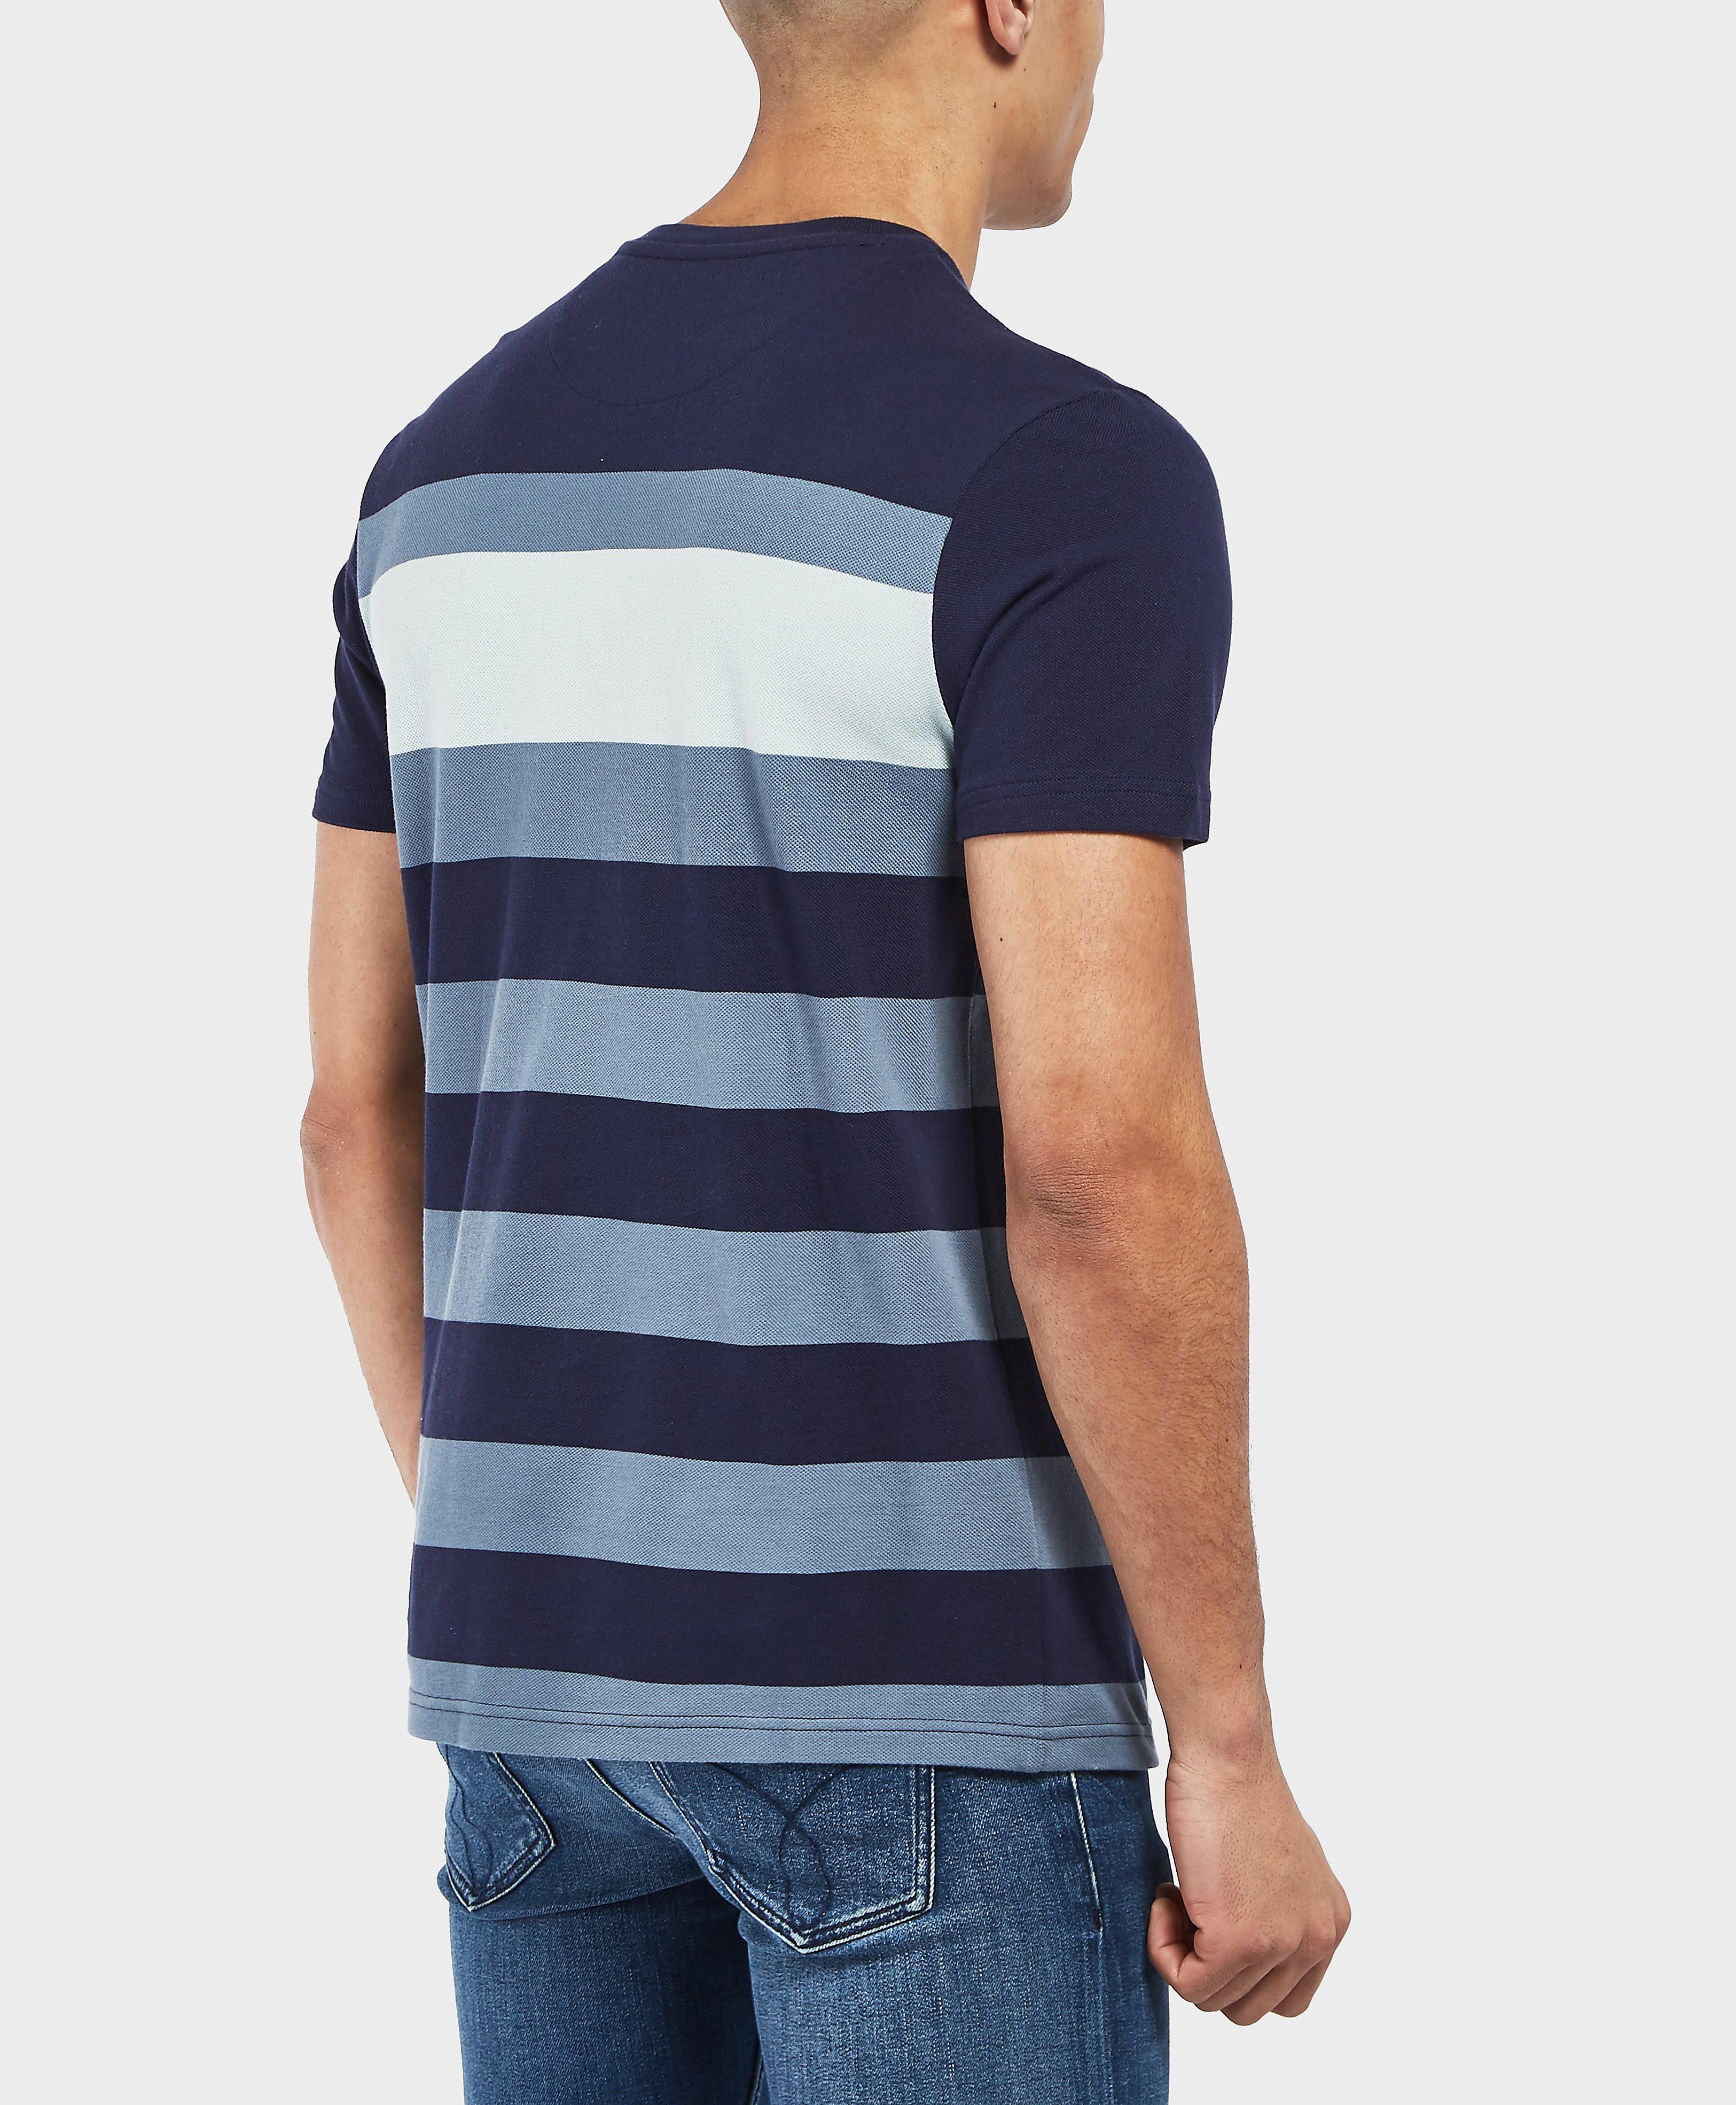 Lyle & Scott Large Stripe Short Sleeve T-Shirt